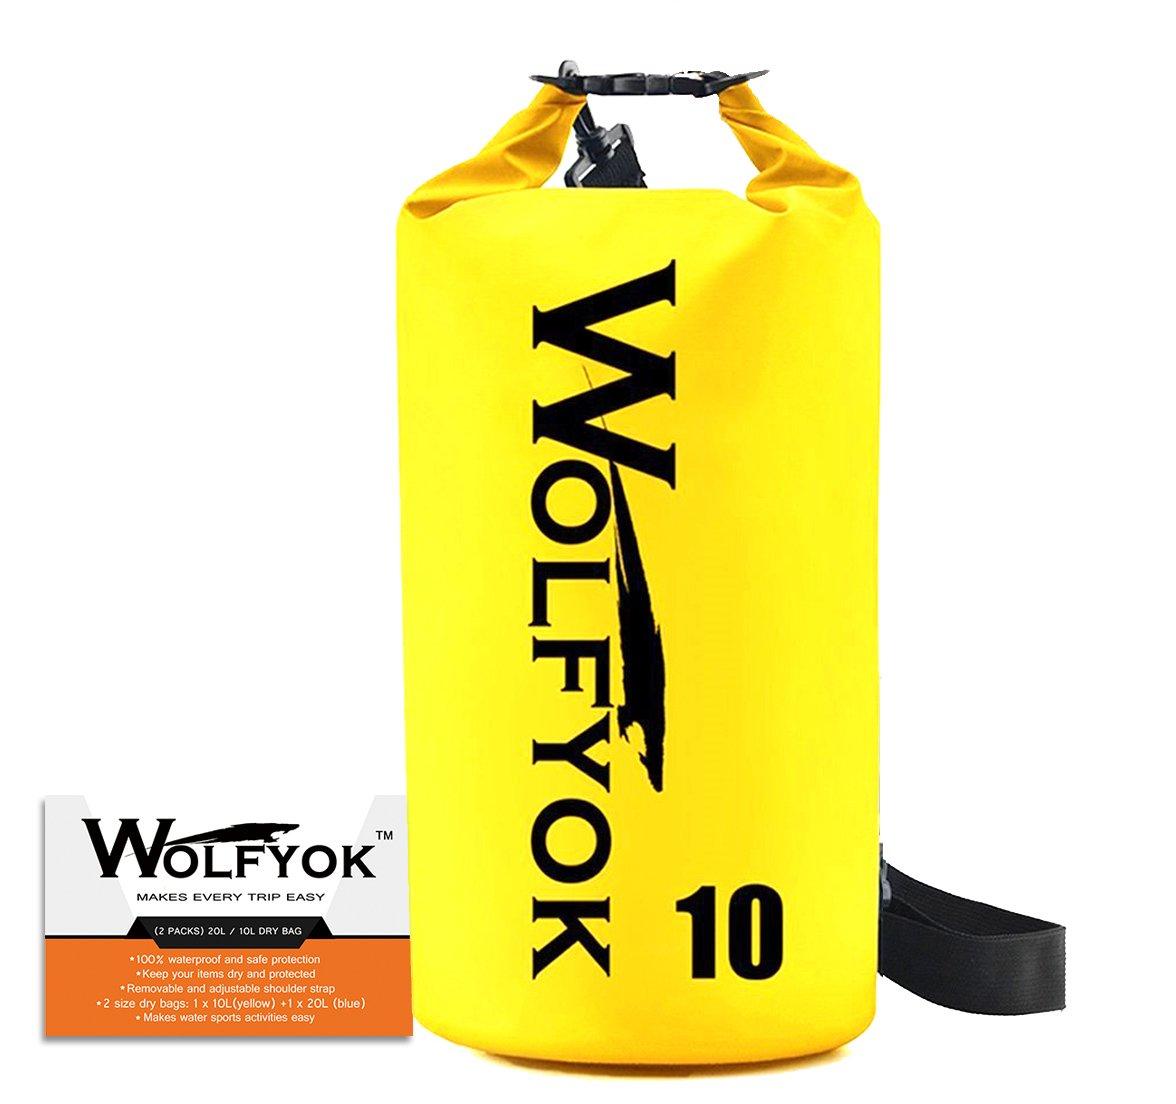 Wolfyok Roll Top Dry Sack